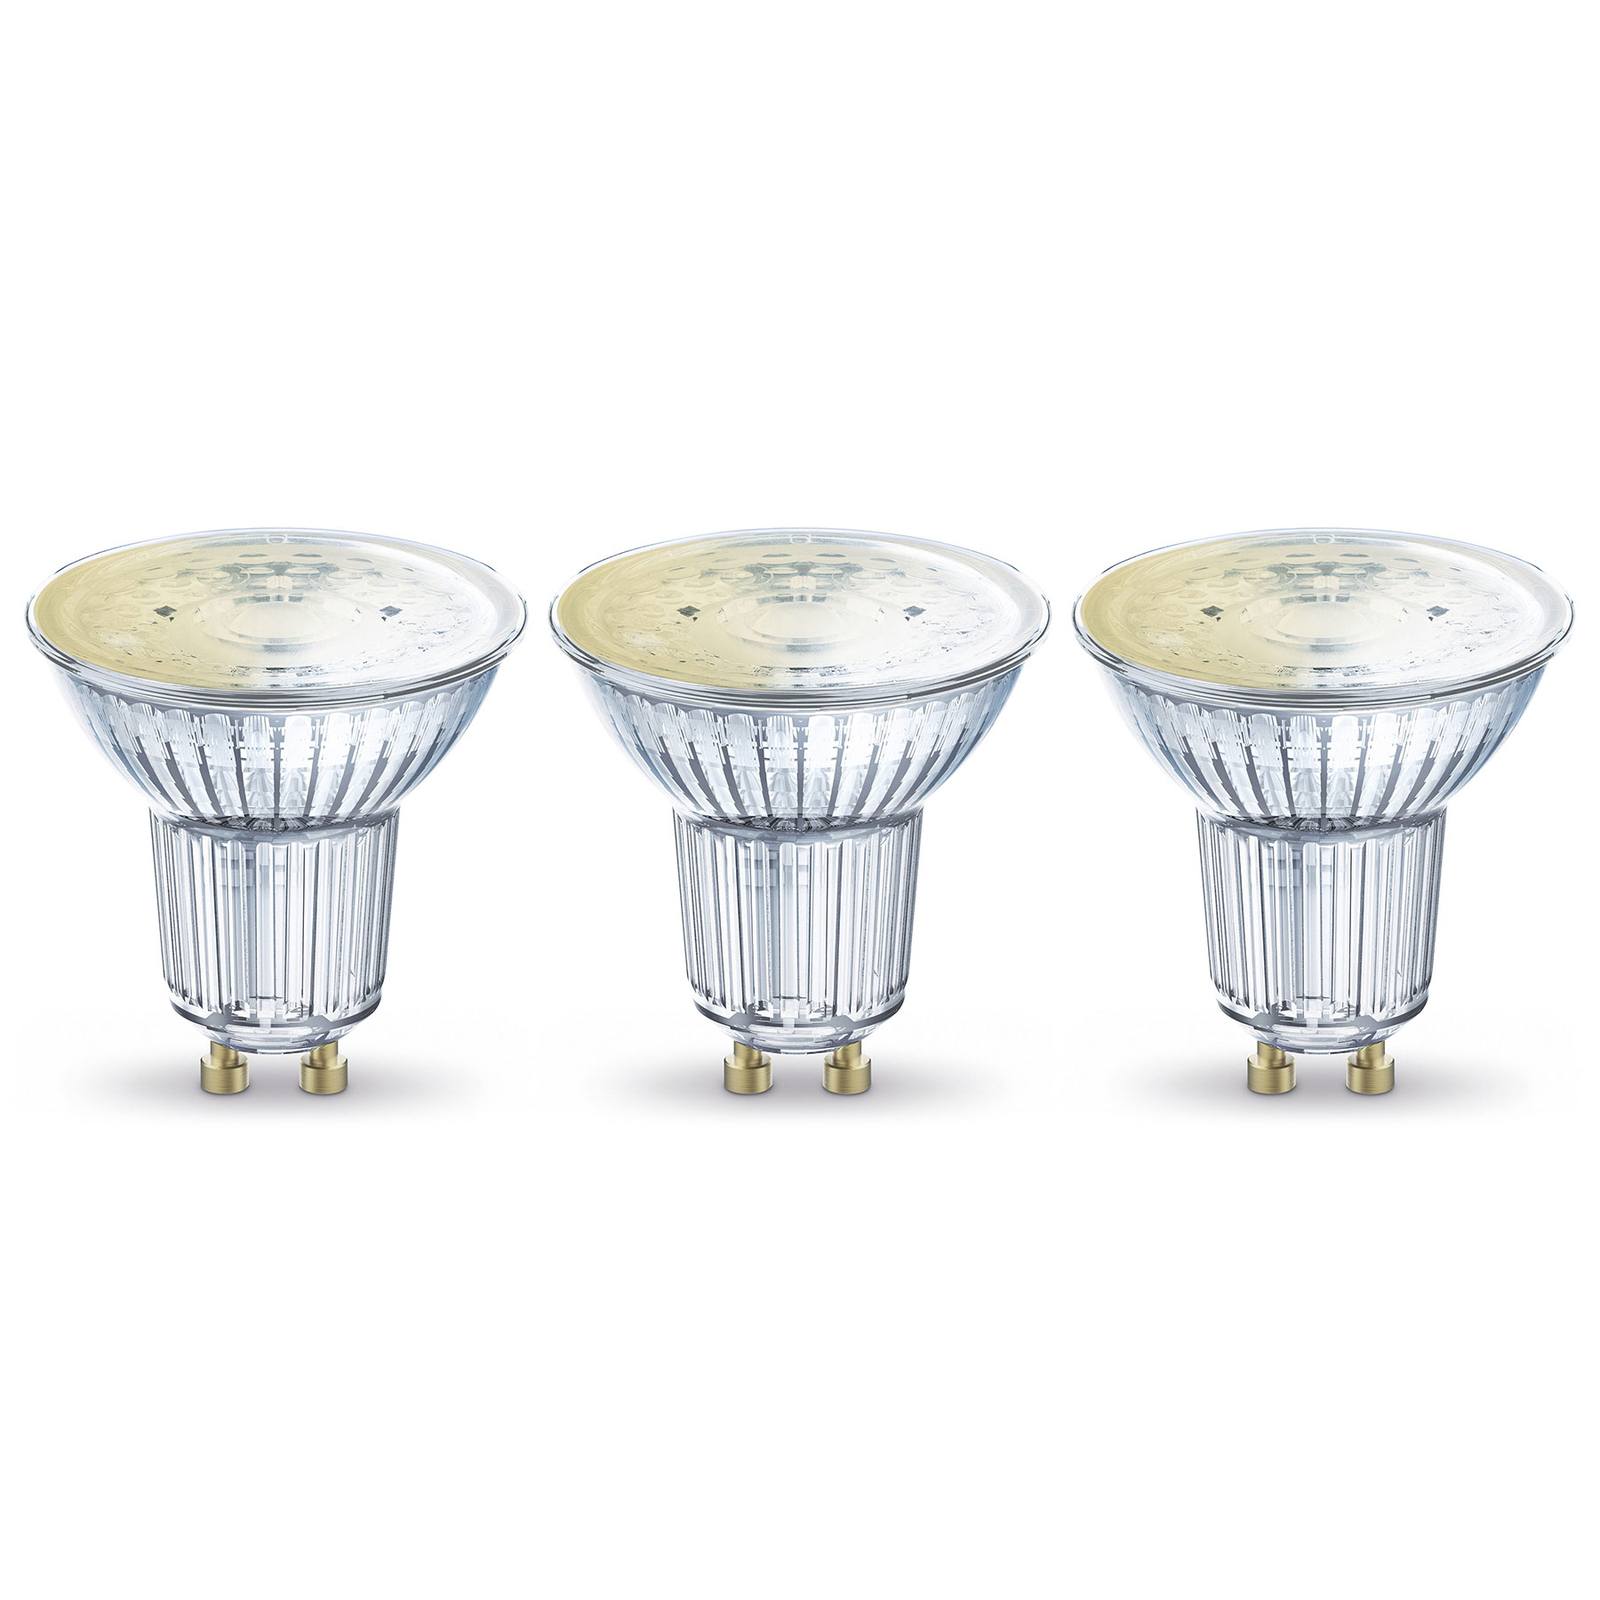 LEDVANCE SMART+ WiFi GU10-Reflektor 5W 45° 827 3er